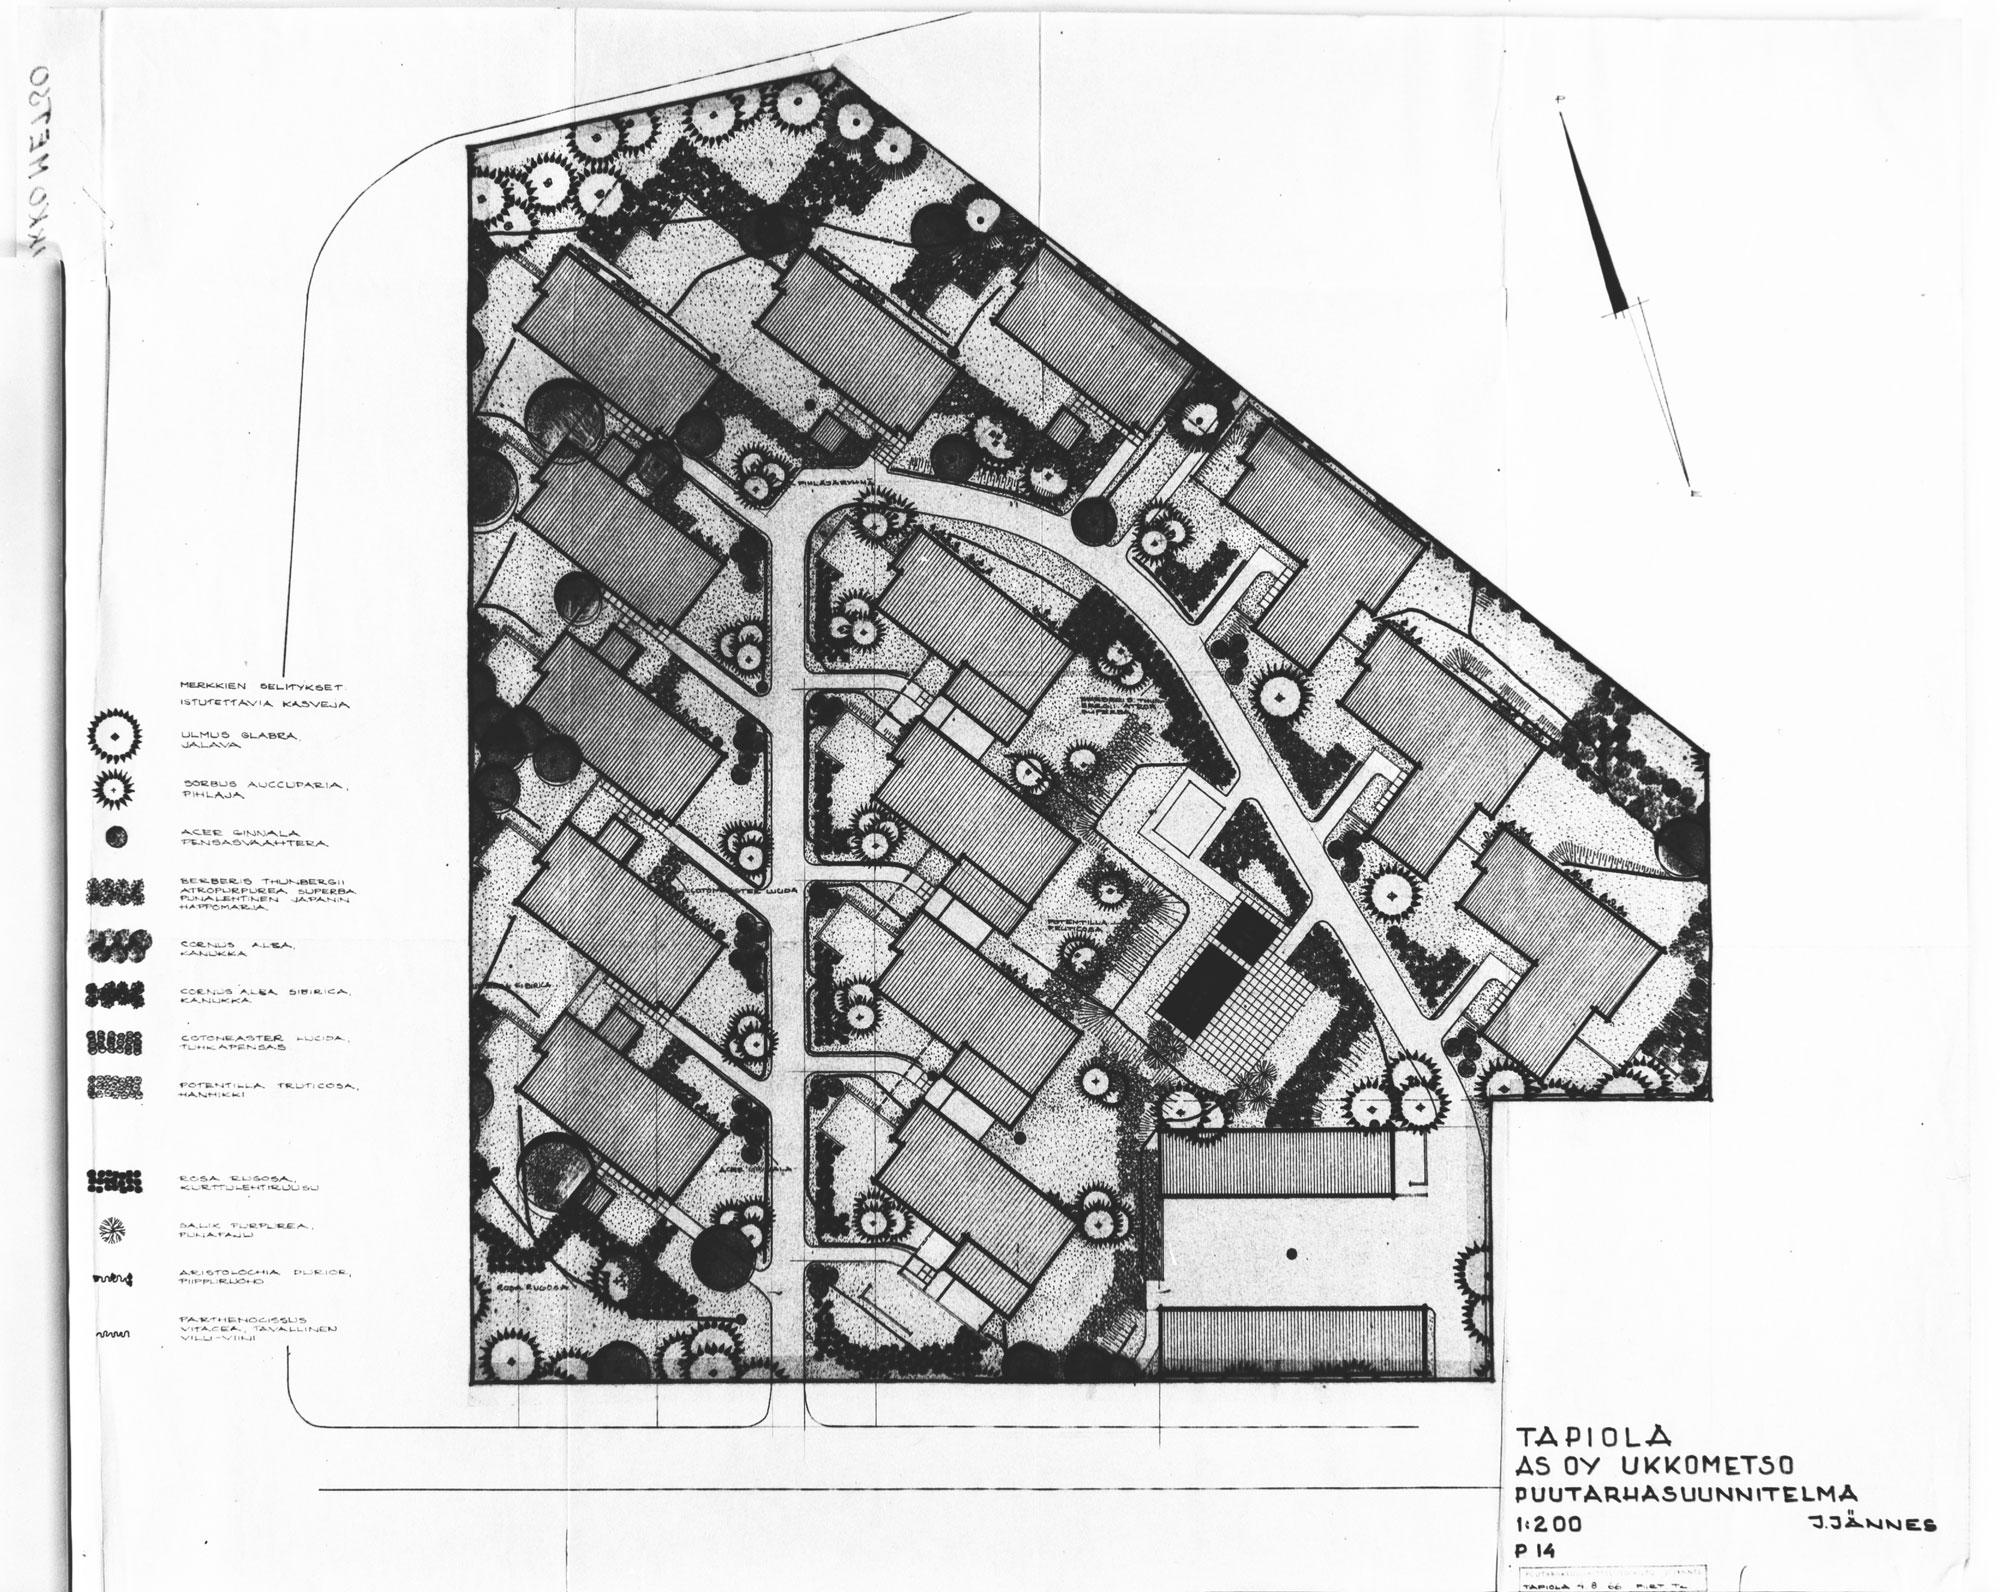 Housing company Ukkometso: Tapiola, Jussi Jännes